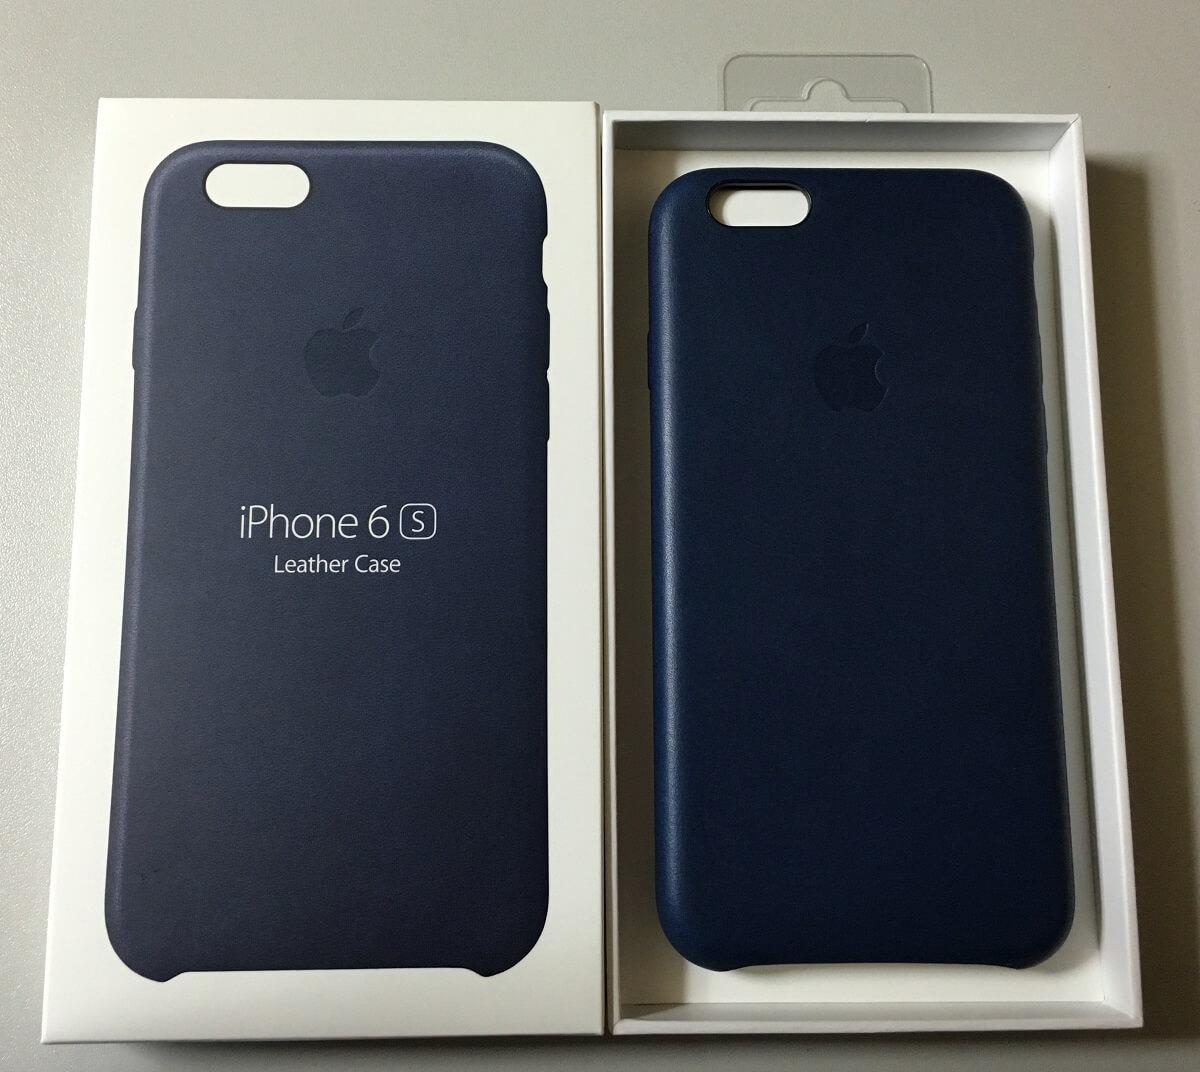 iphone6sleathercase01